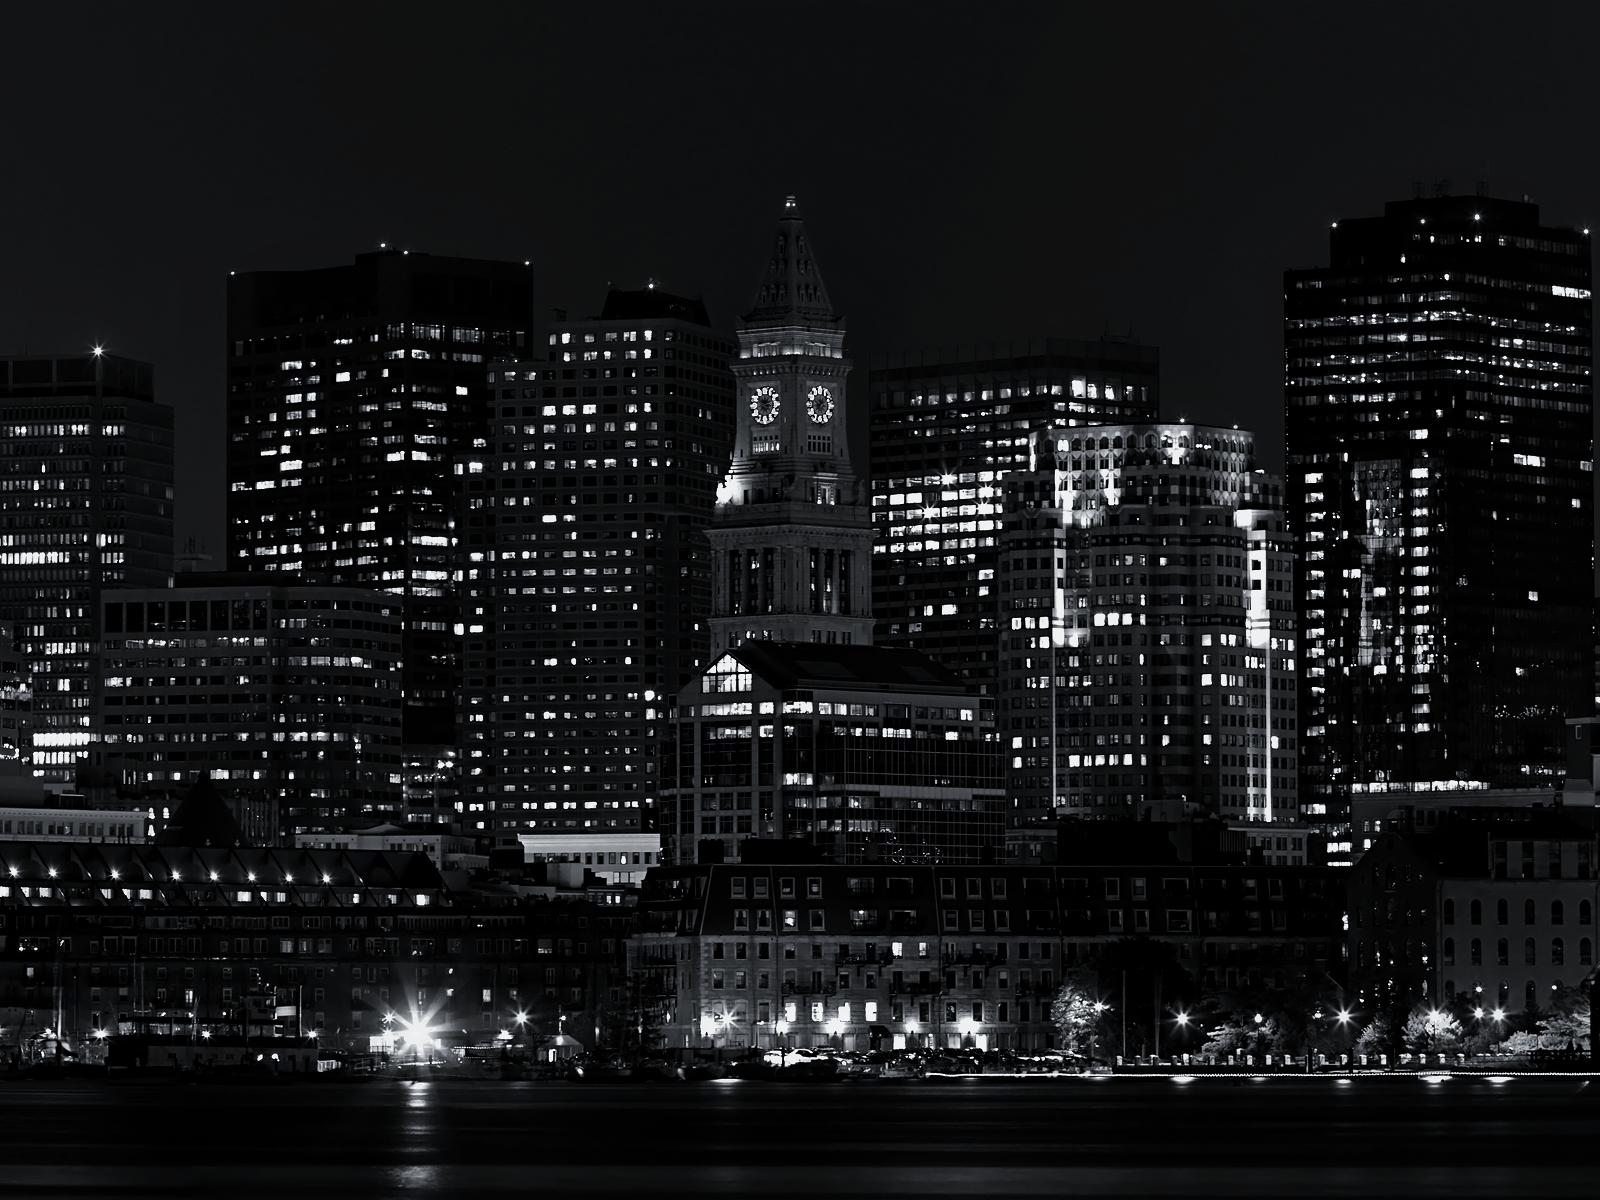 boston skyline image - media file | pixelstalk